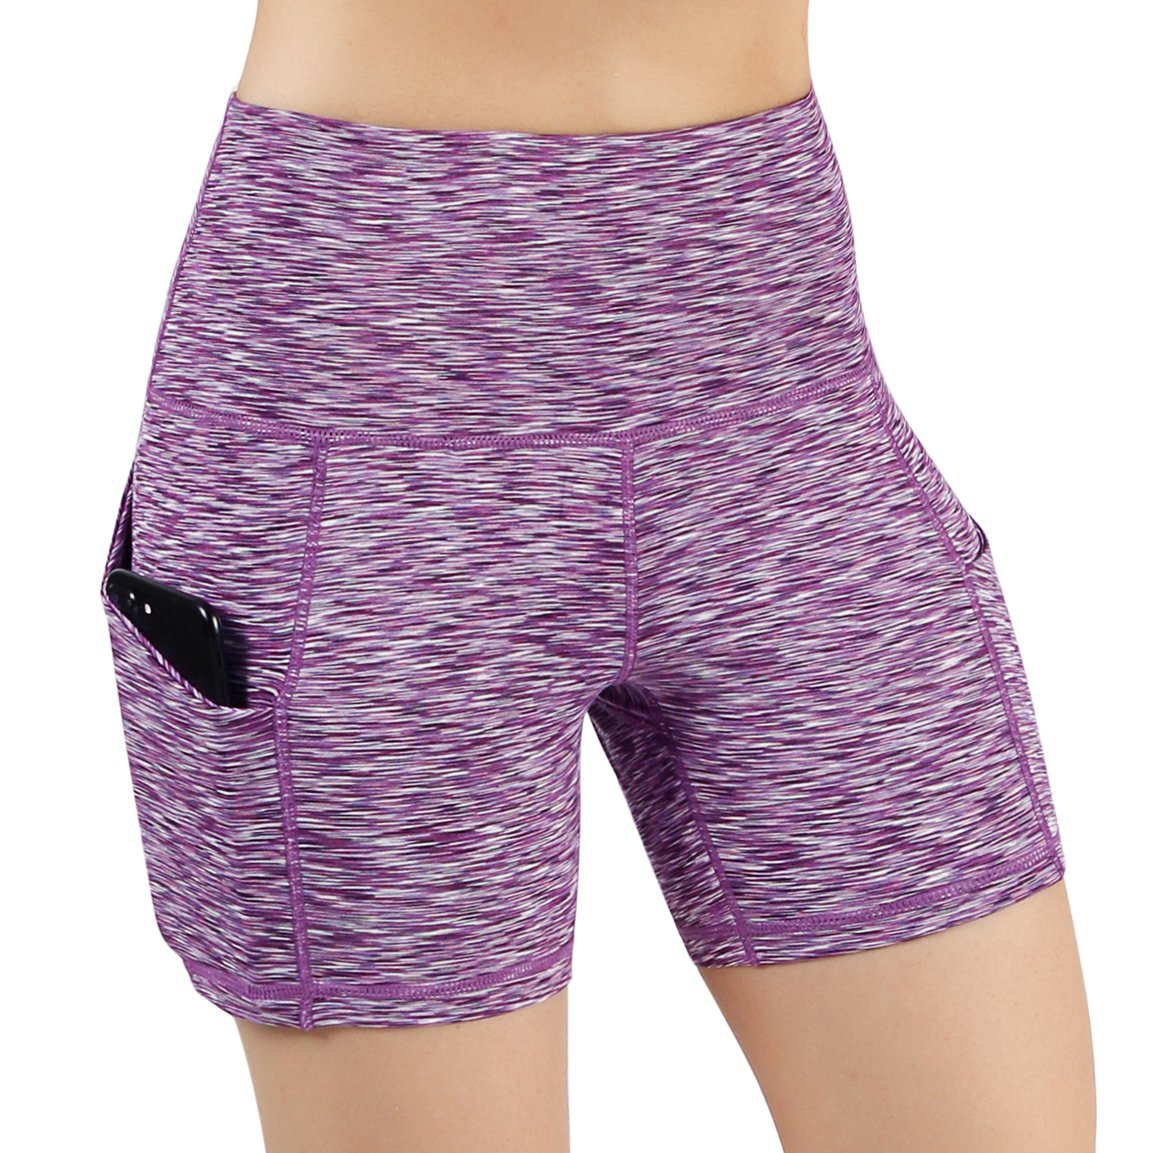 Yogapocketshots525spacedyepurple ODODOS High Waist Out Pocket Yoga Short Tummy Control Workout Running Athletic Non SeeThrough Yoga Shorts